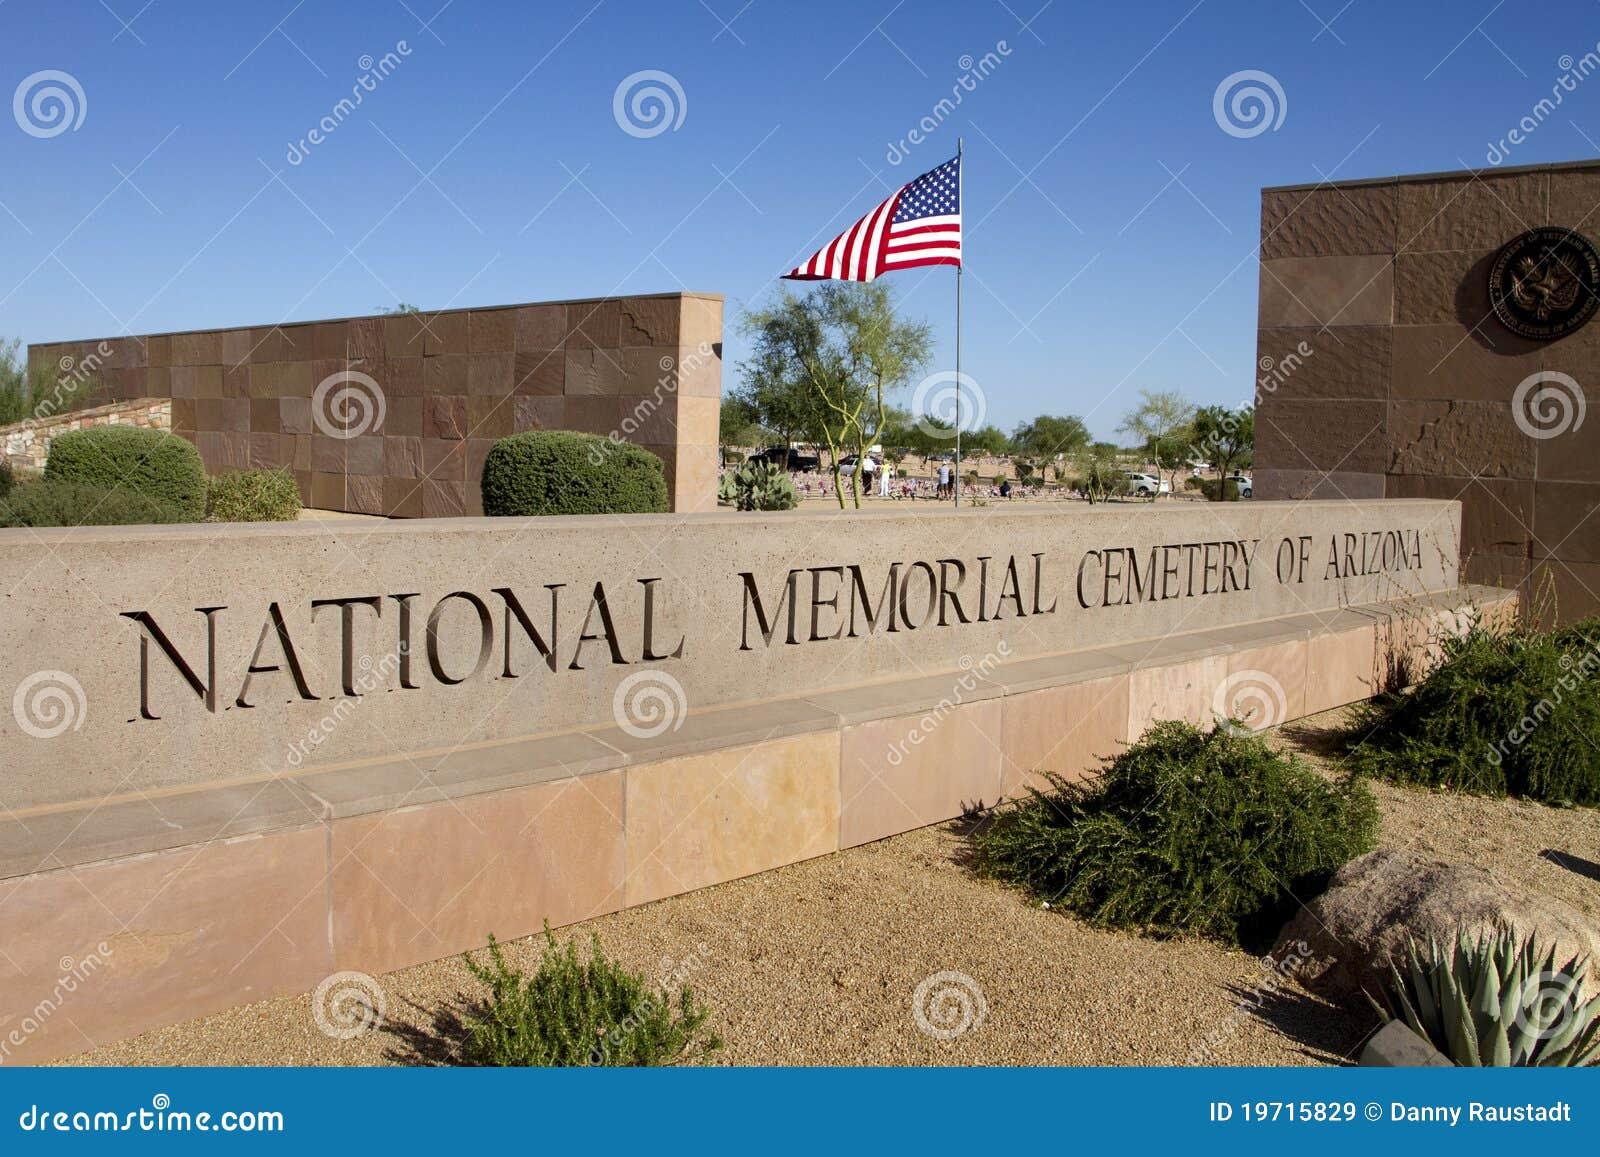 veterans national memorial cemetery of arizona editorial washington monument clip art black and white washington monument clipart free